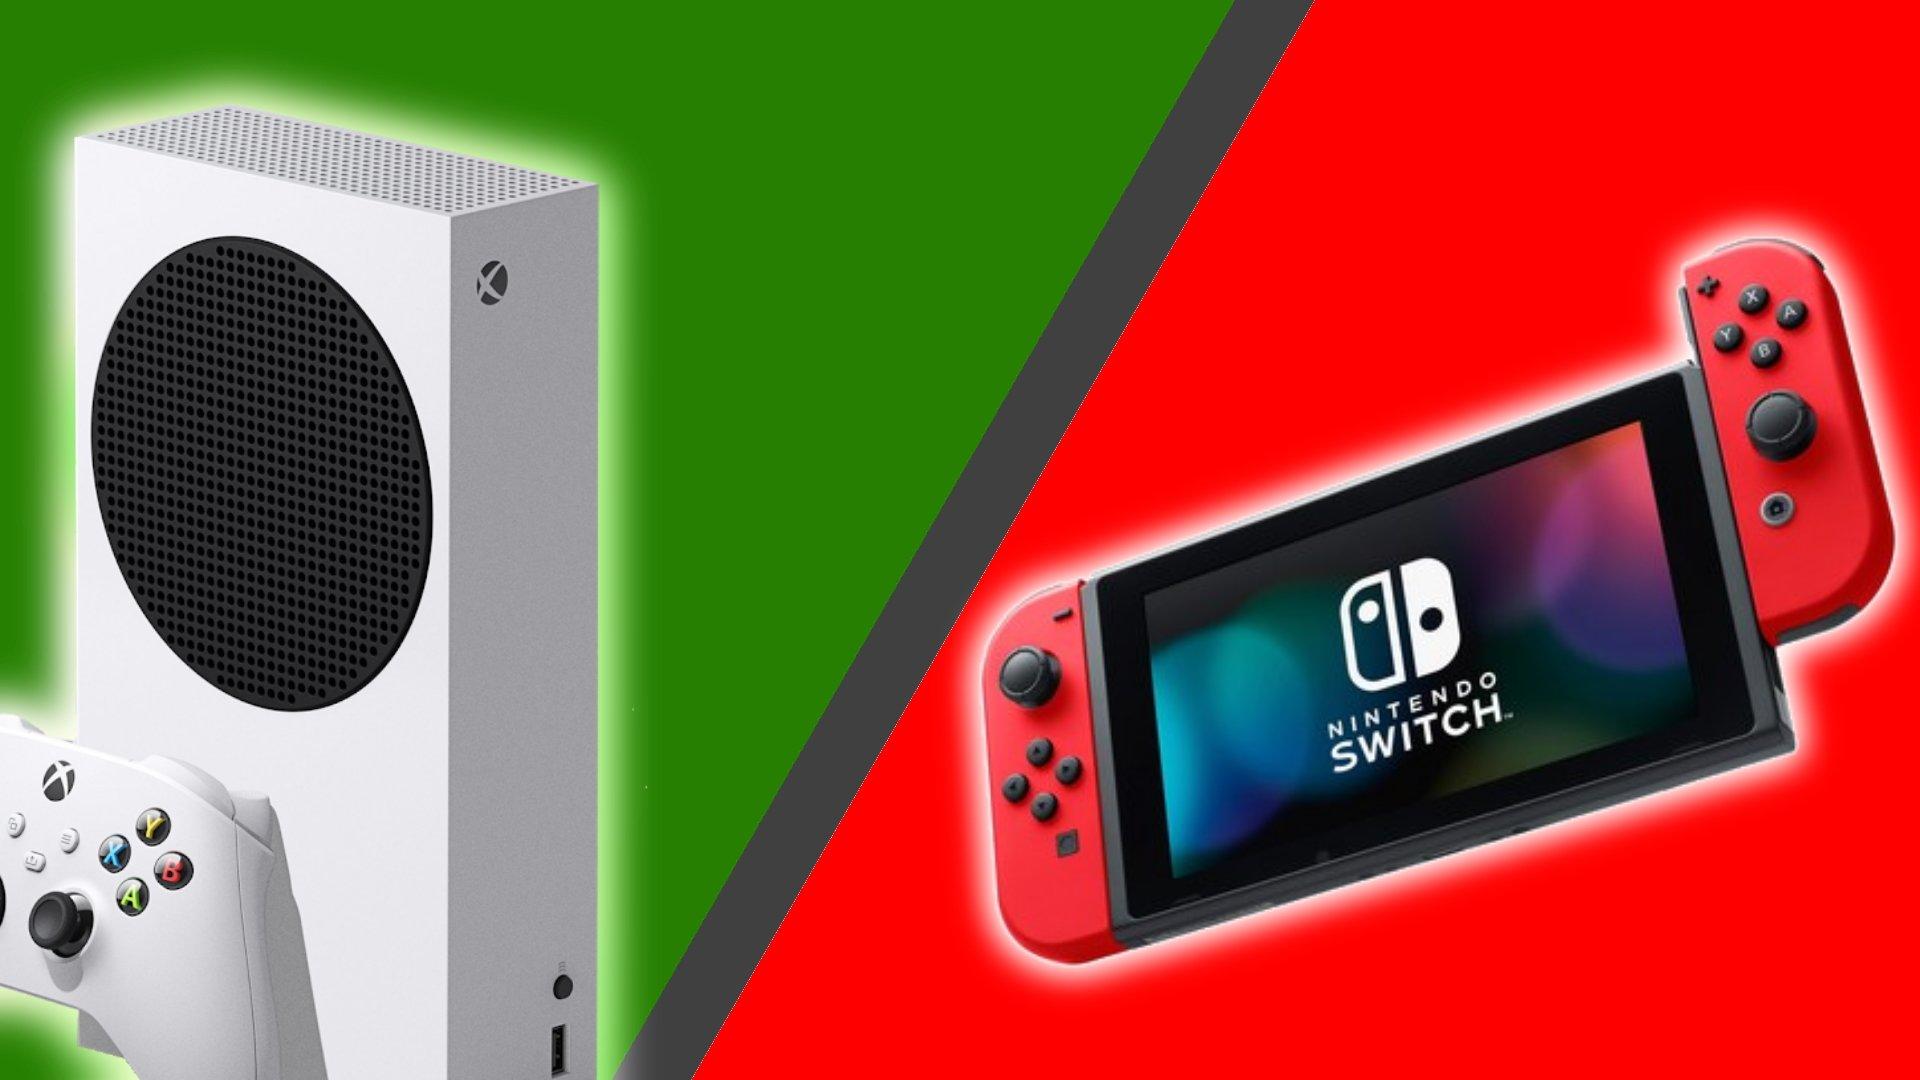 Xbox Series X vs Nintendo Switch